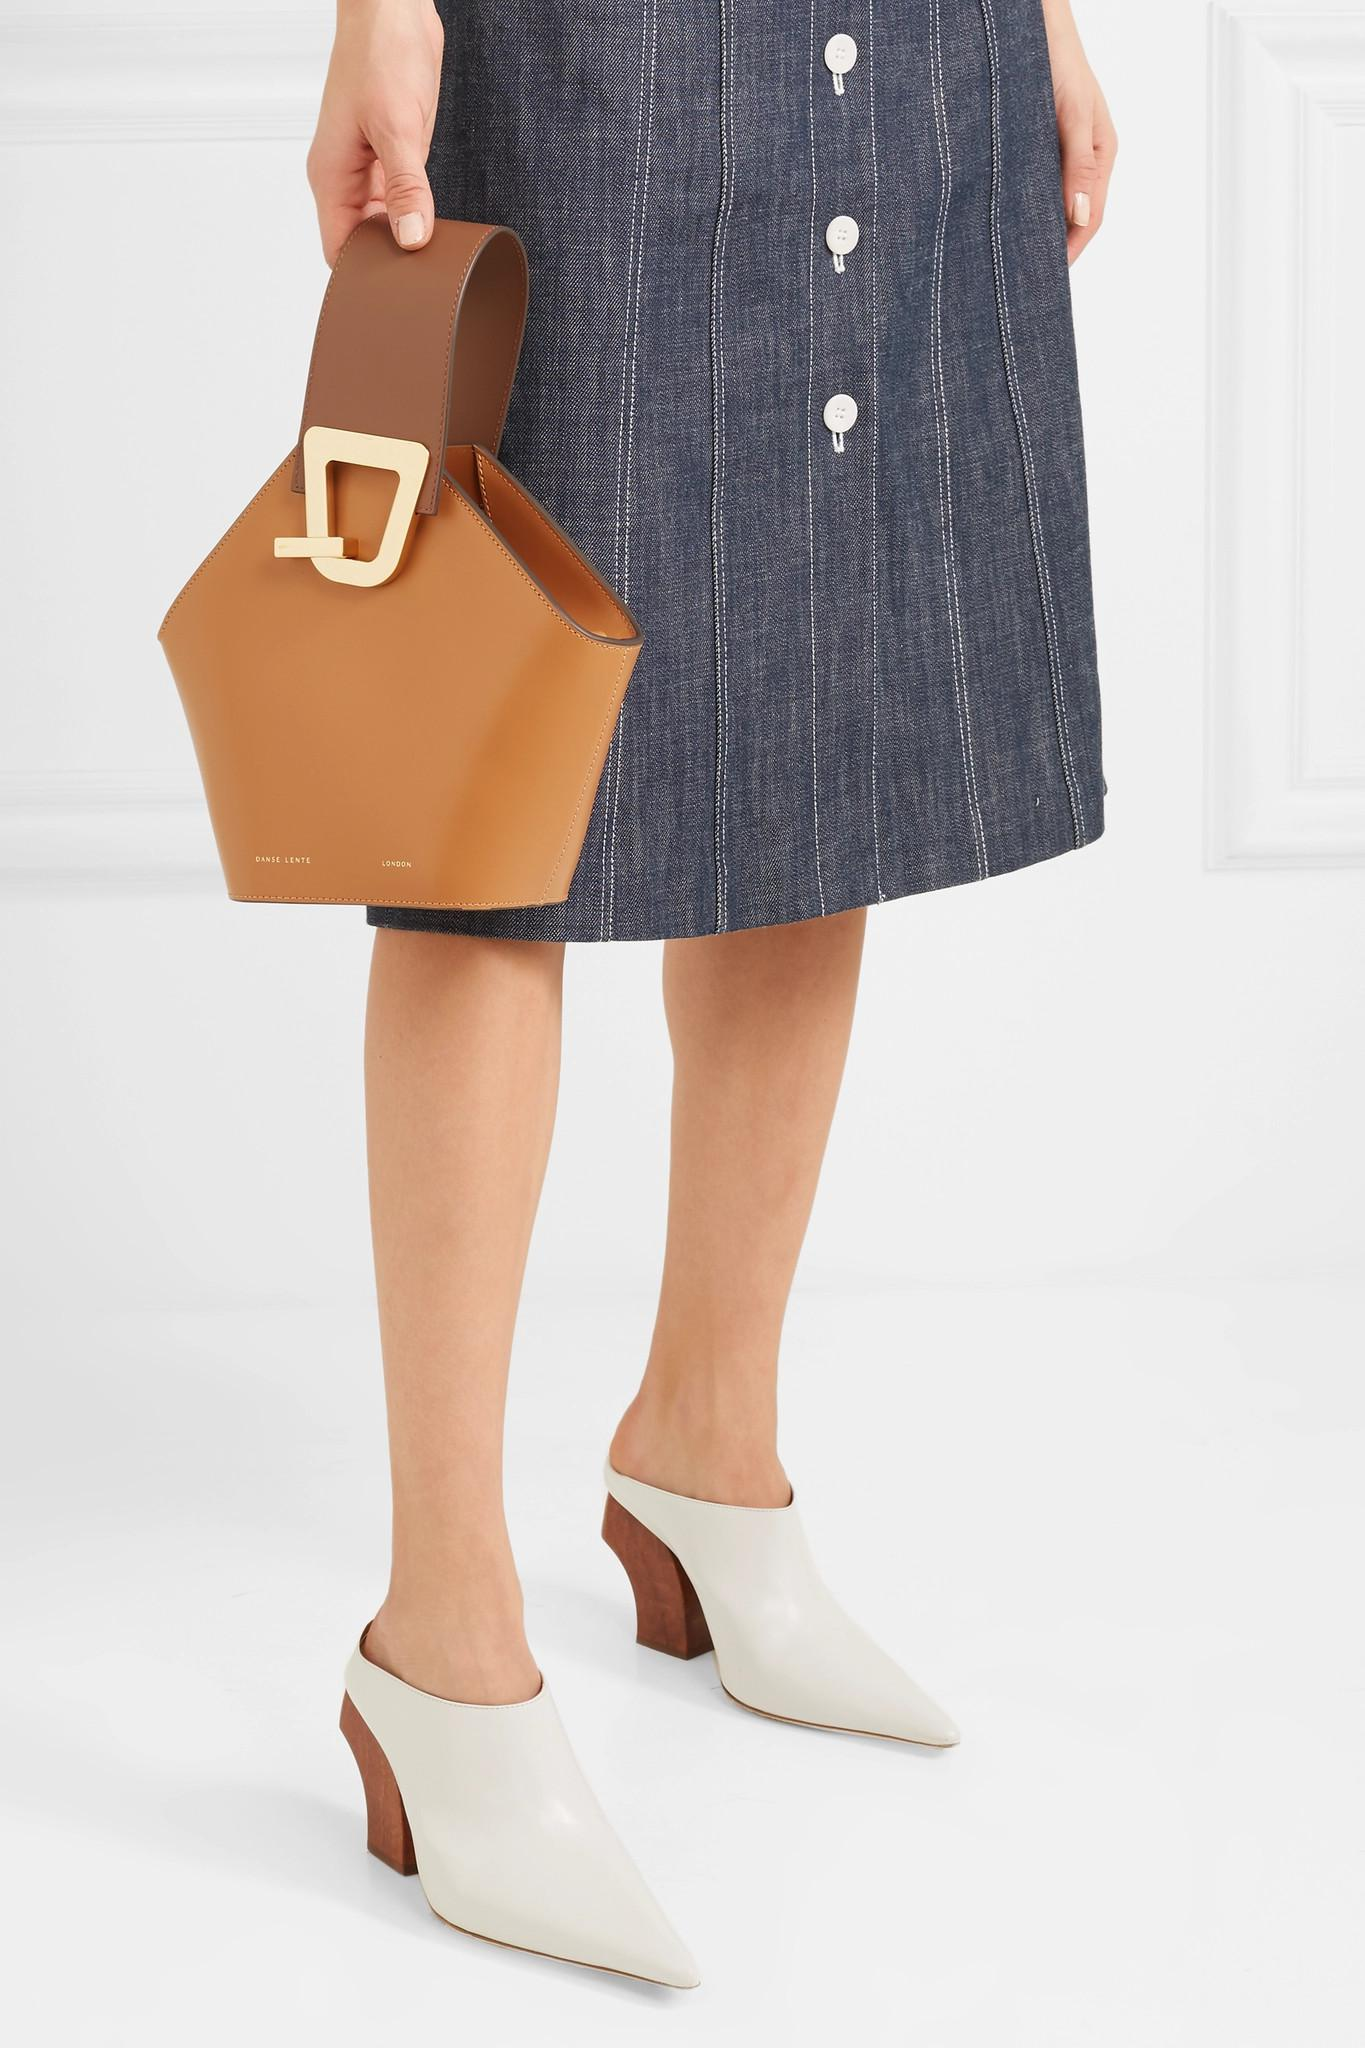 d7612e7e4cab Lyst - Danse Lente Mini Johnny Leather Top Handle Bag in Brown